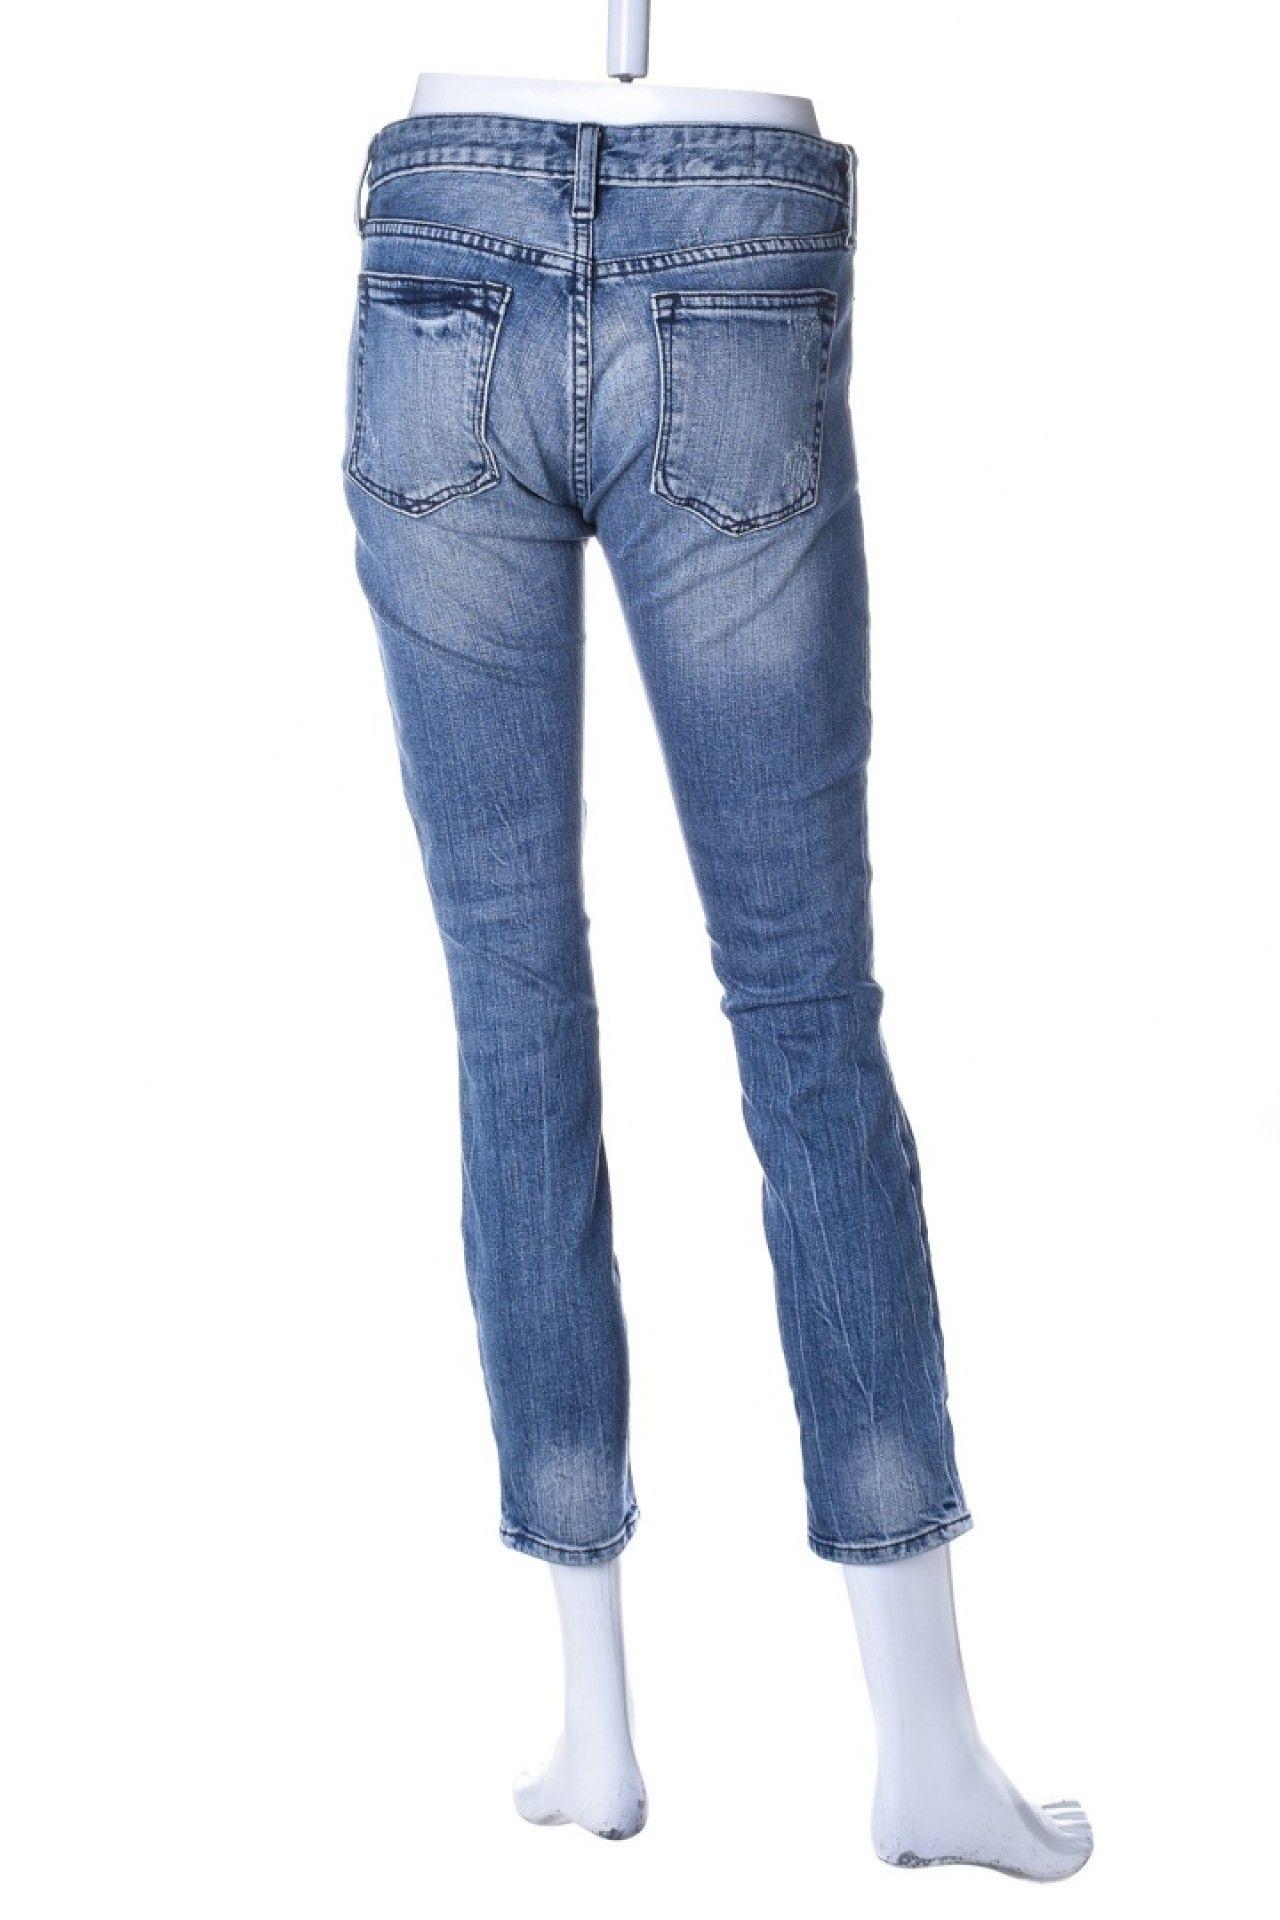 Gap - Calça Jeans Destroyed  - Foto 2